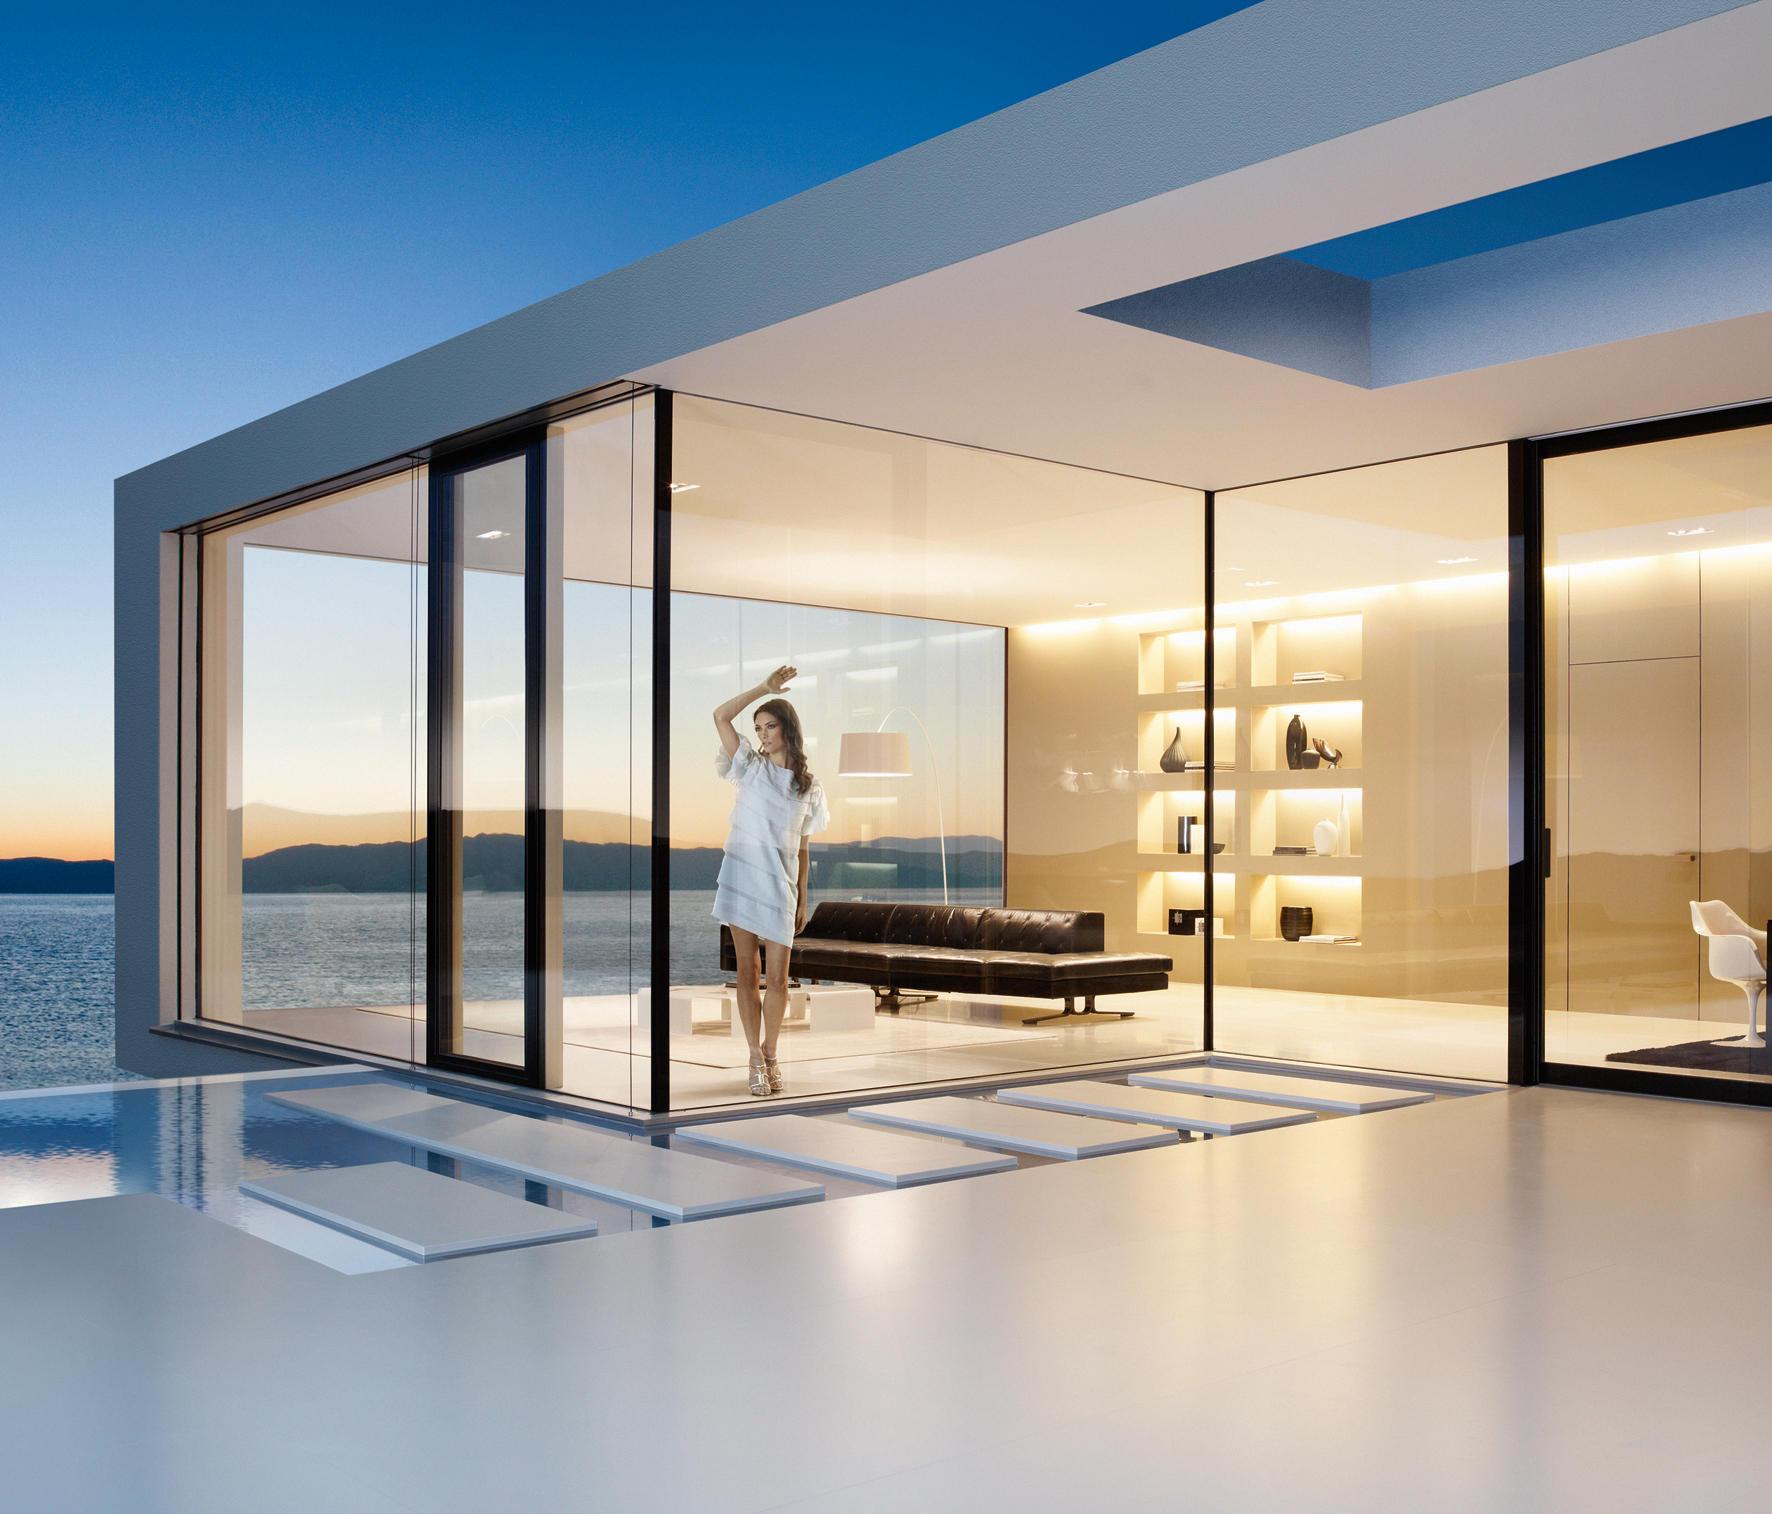 fixframe blue vision fenstersysteme von josko architonic. Black Bedroom Furniture Sets. Home Design Ideas